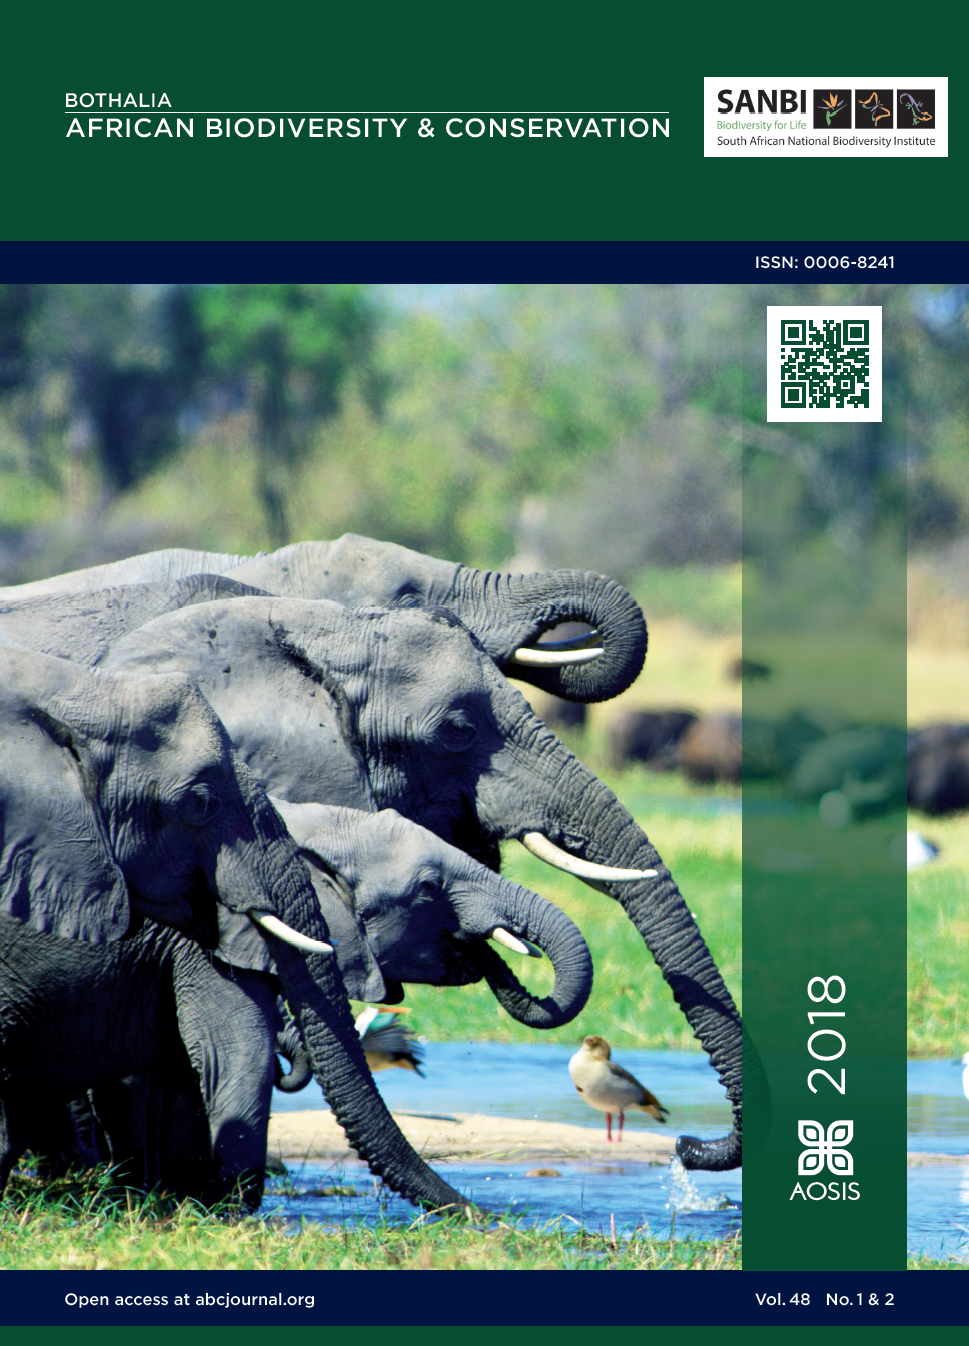 View Vol. 48 No. 1 (2018): Bothalia, African Biodiversity & Conservation